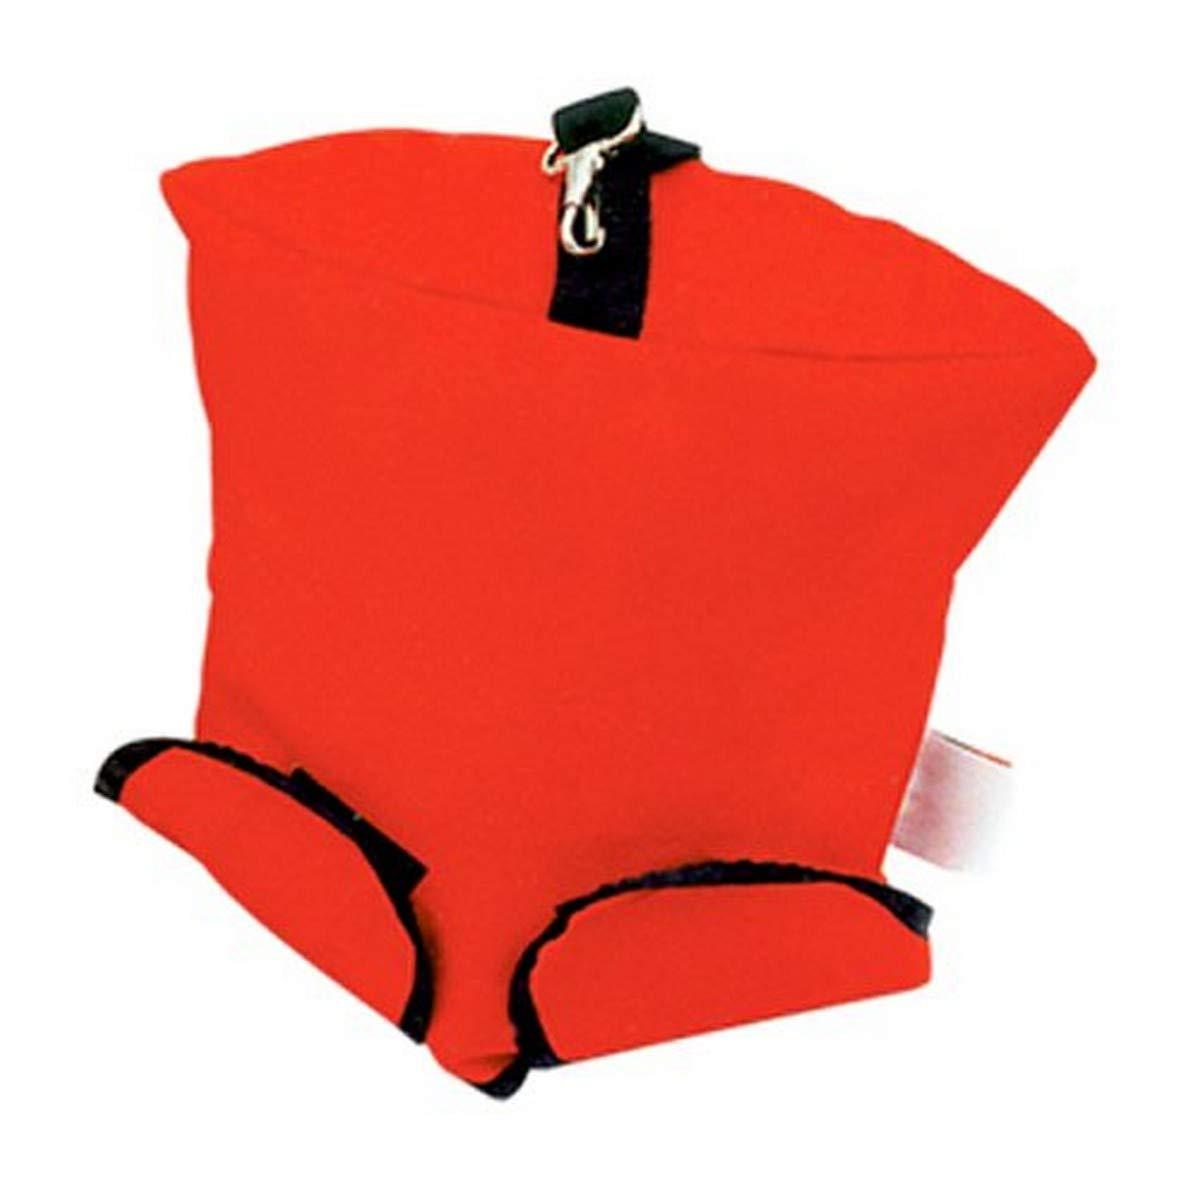 R&B Fabrications 426RD Mesh Vented Air Mask Bag, Red